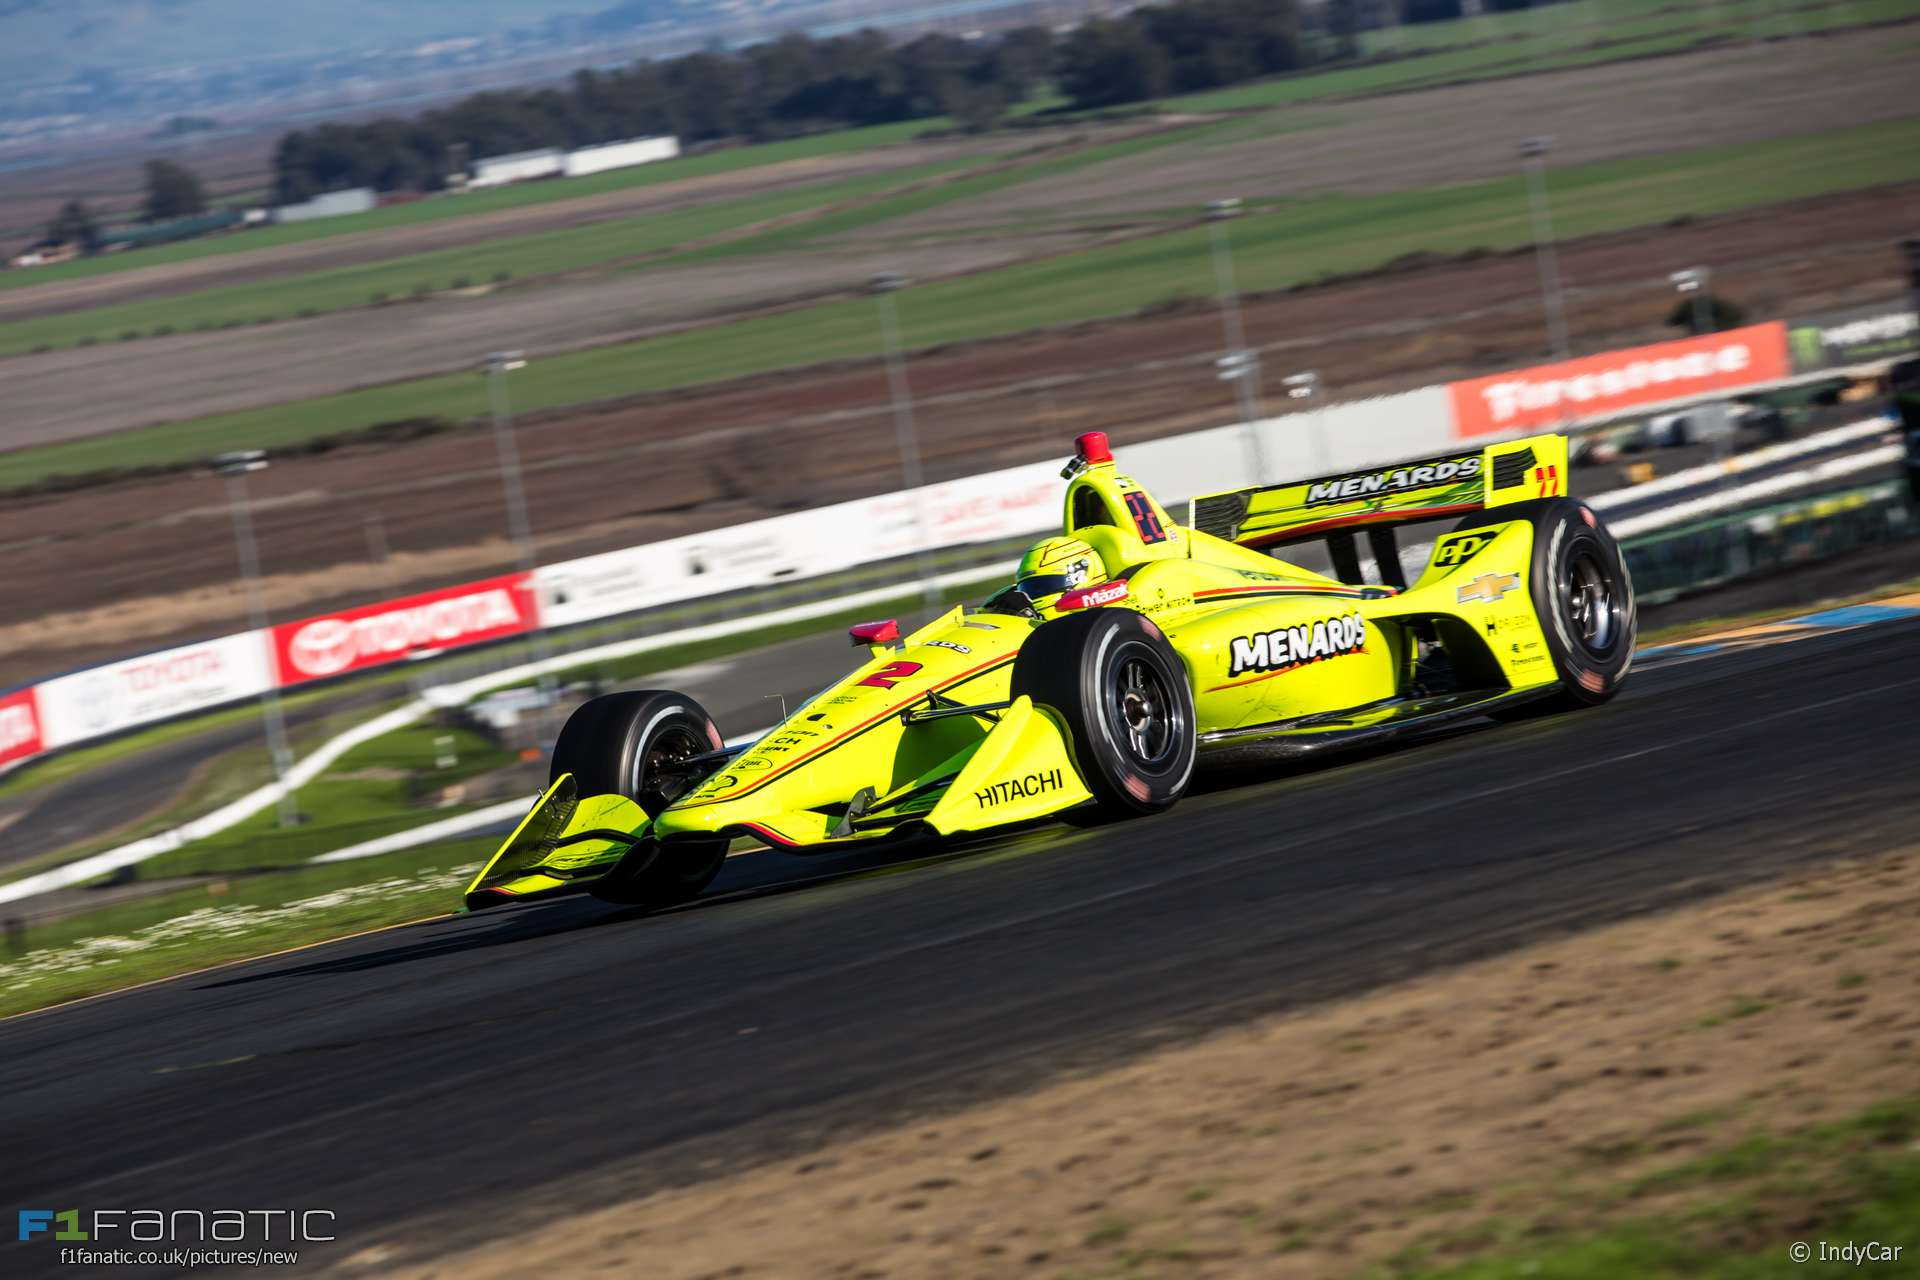 Simon Pagenaud, Penske, IndyCar, Sonoma, 2018